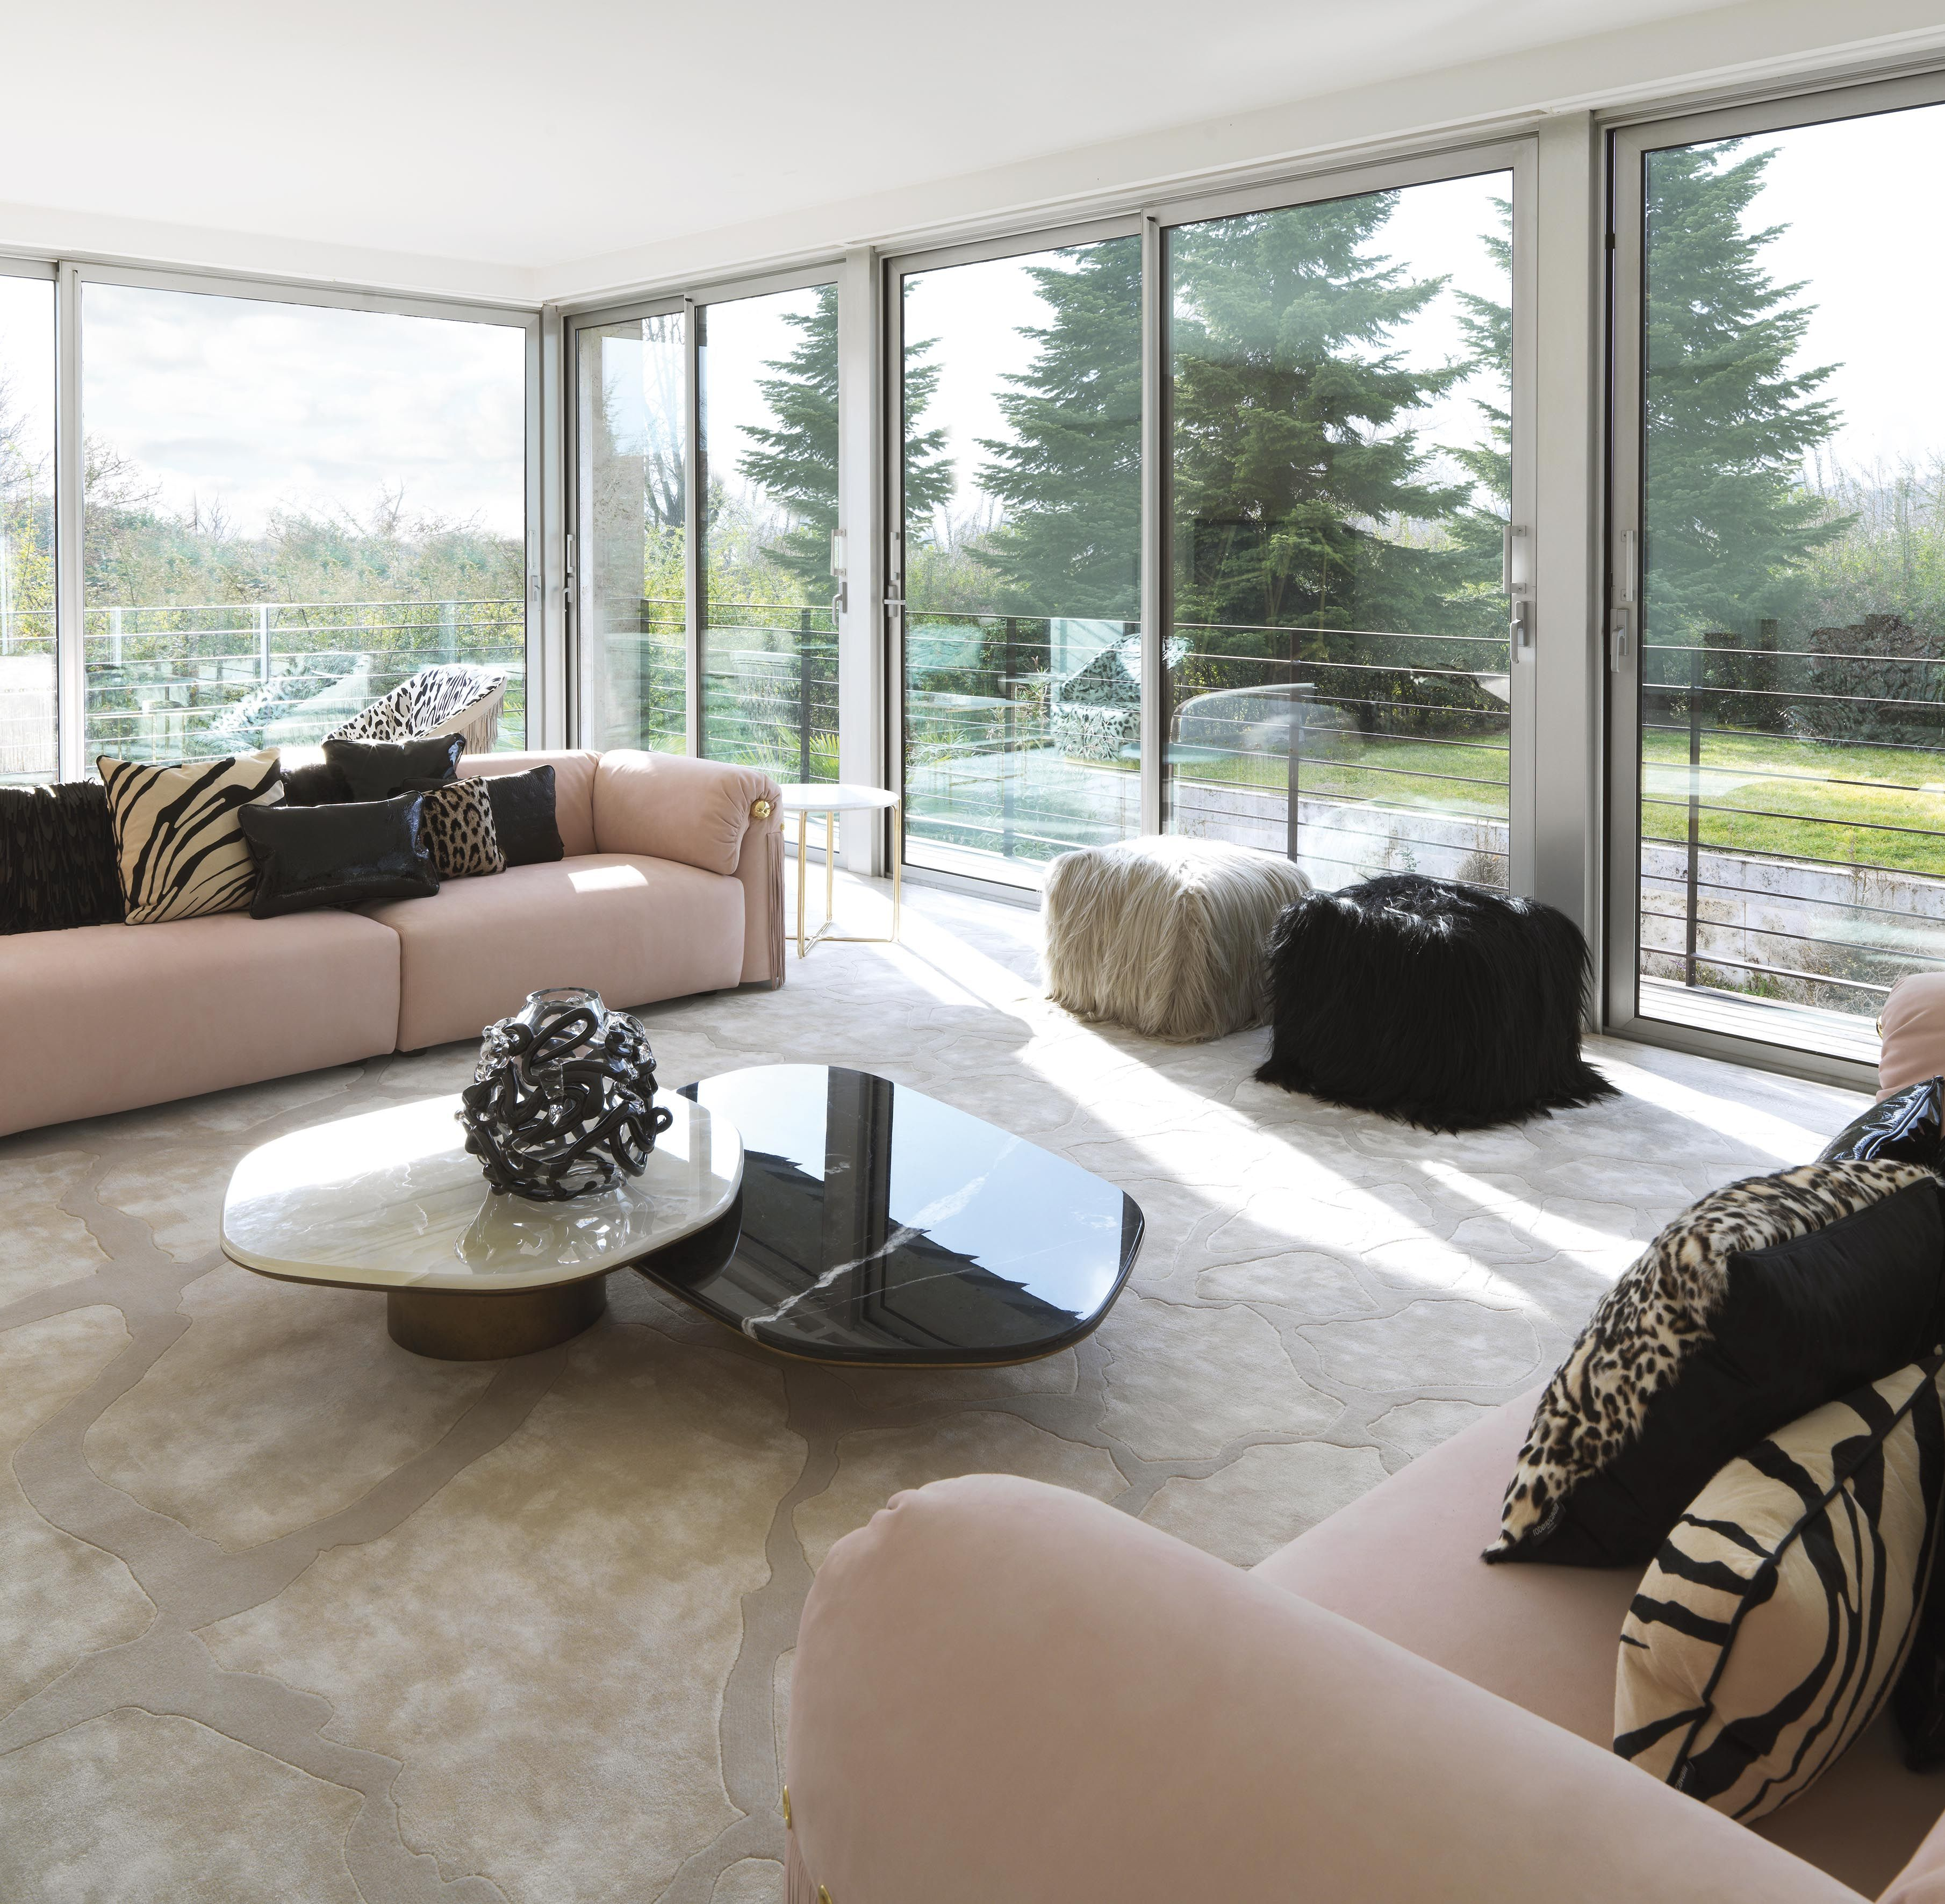 Roberto Cavalli Home Interiors 2019 Contemporary Furniture Design Home Outdoor Furniture Decor